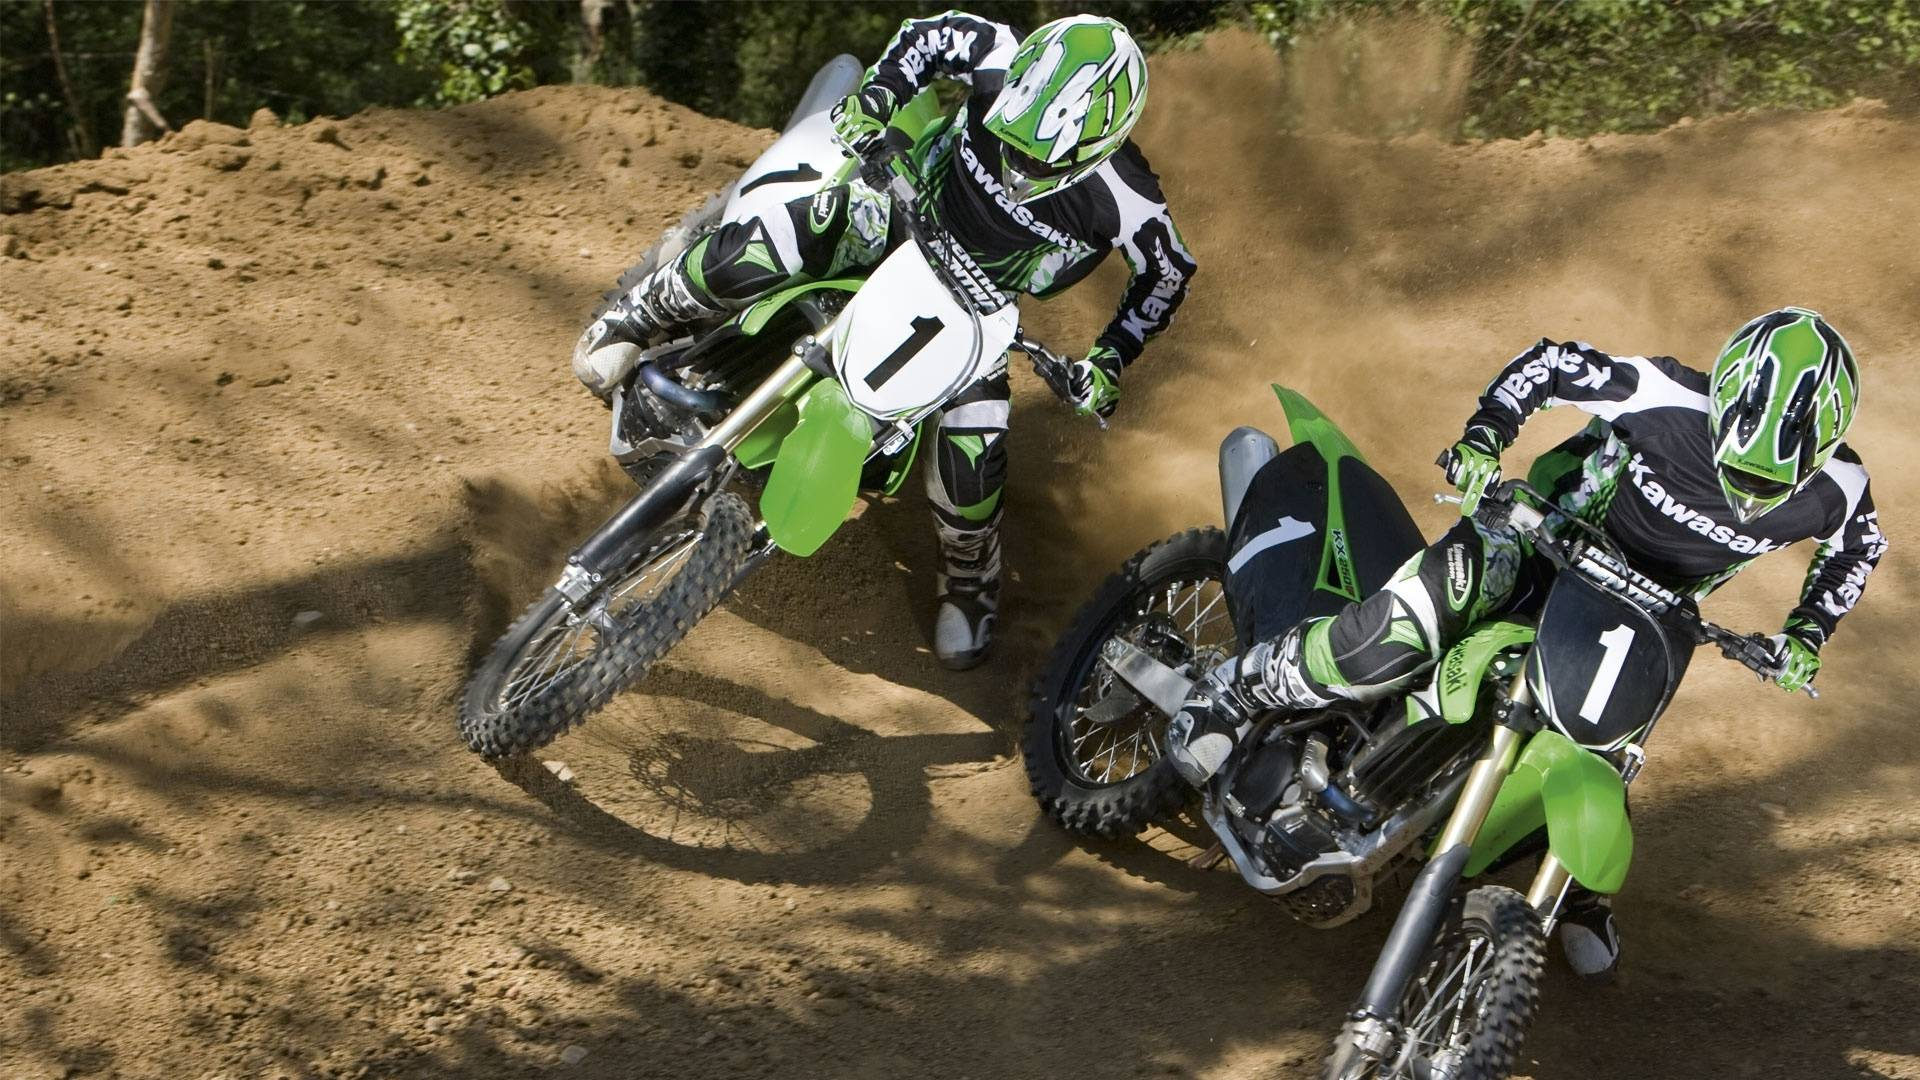 motocross fonds d'écran